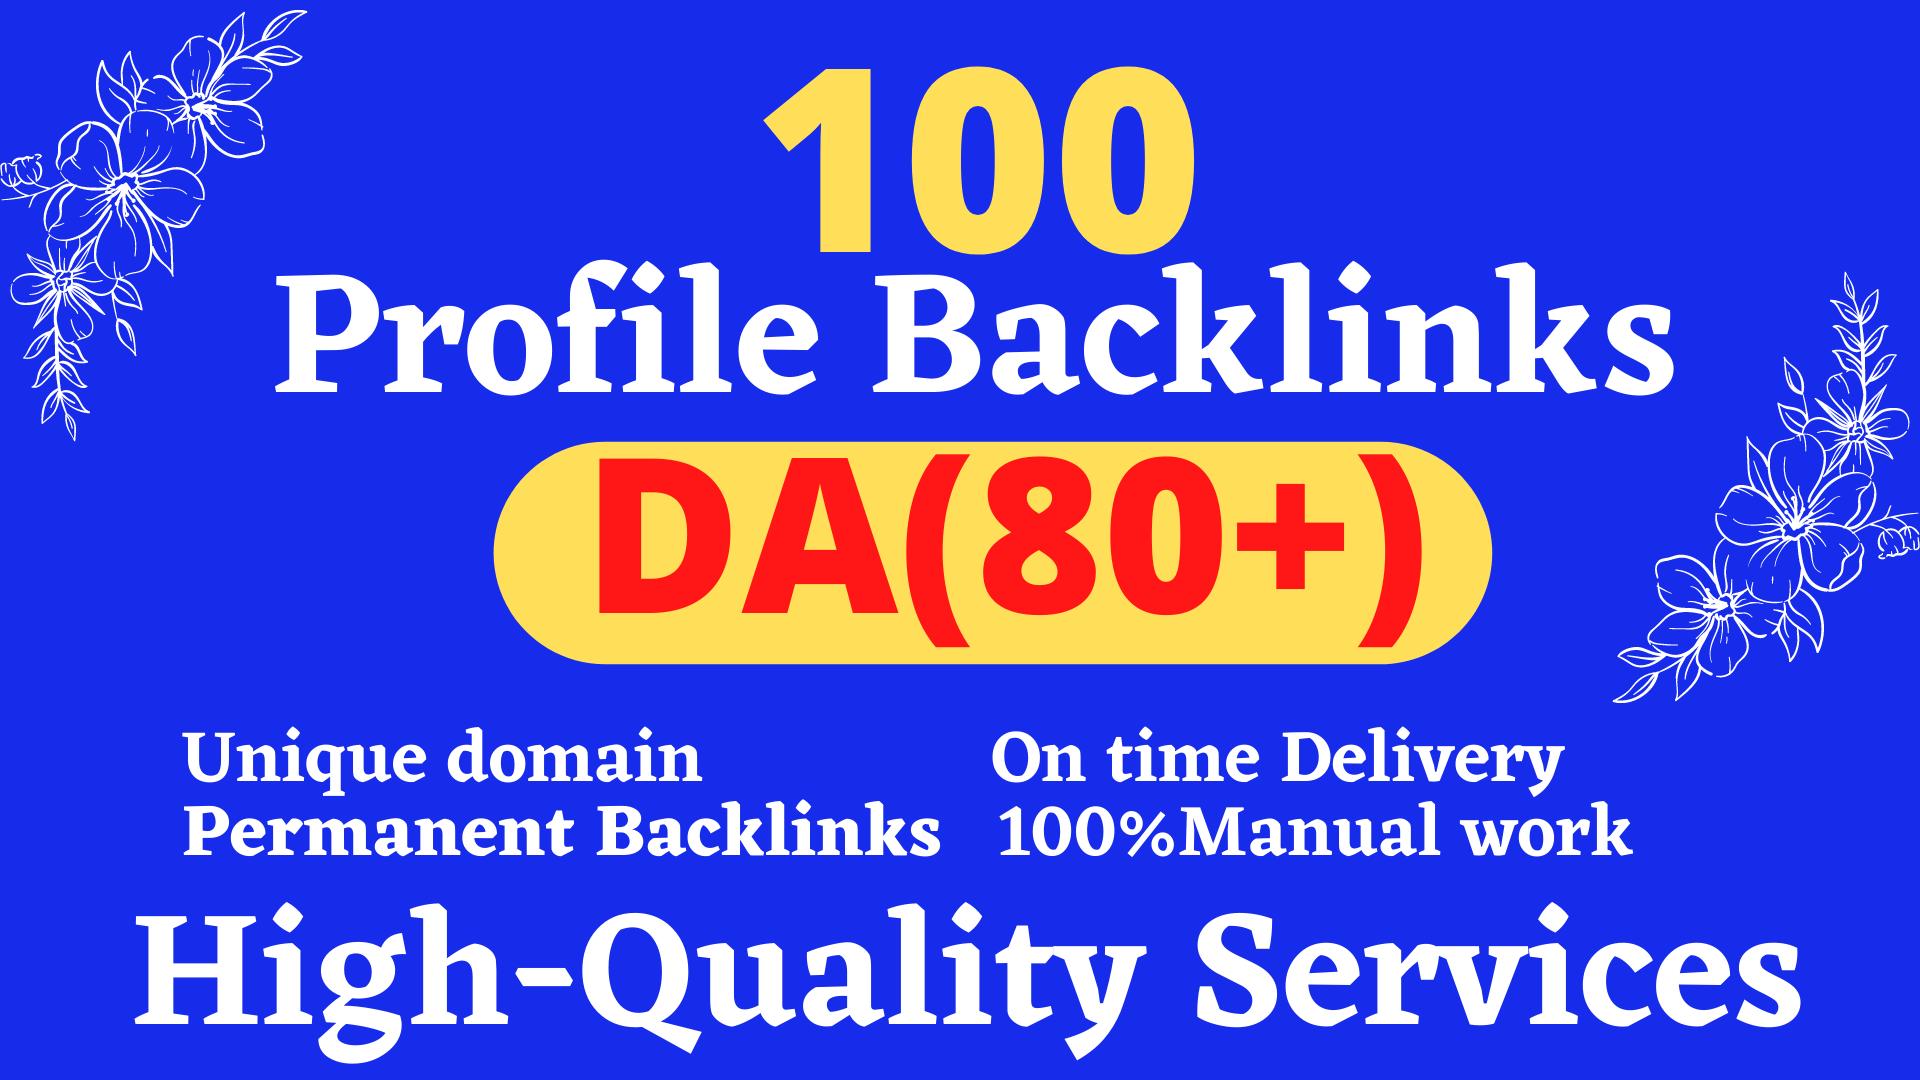 Manually create 100 TOP BRAND 80+DA Backlinks